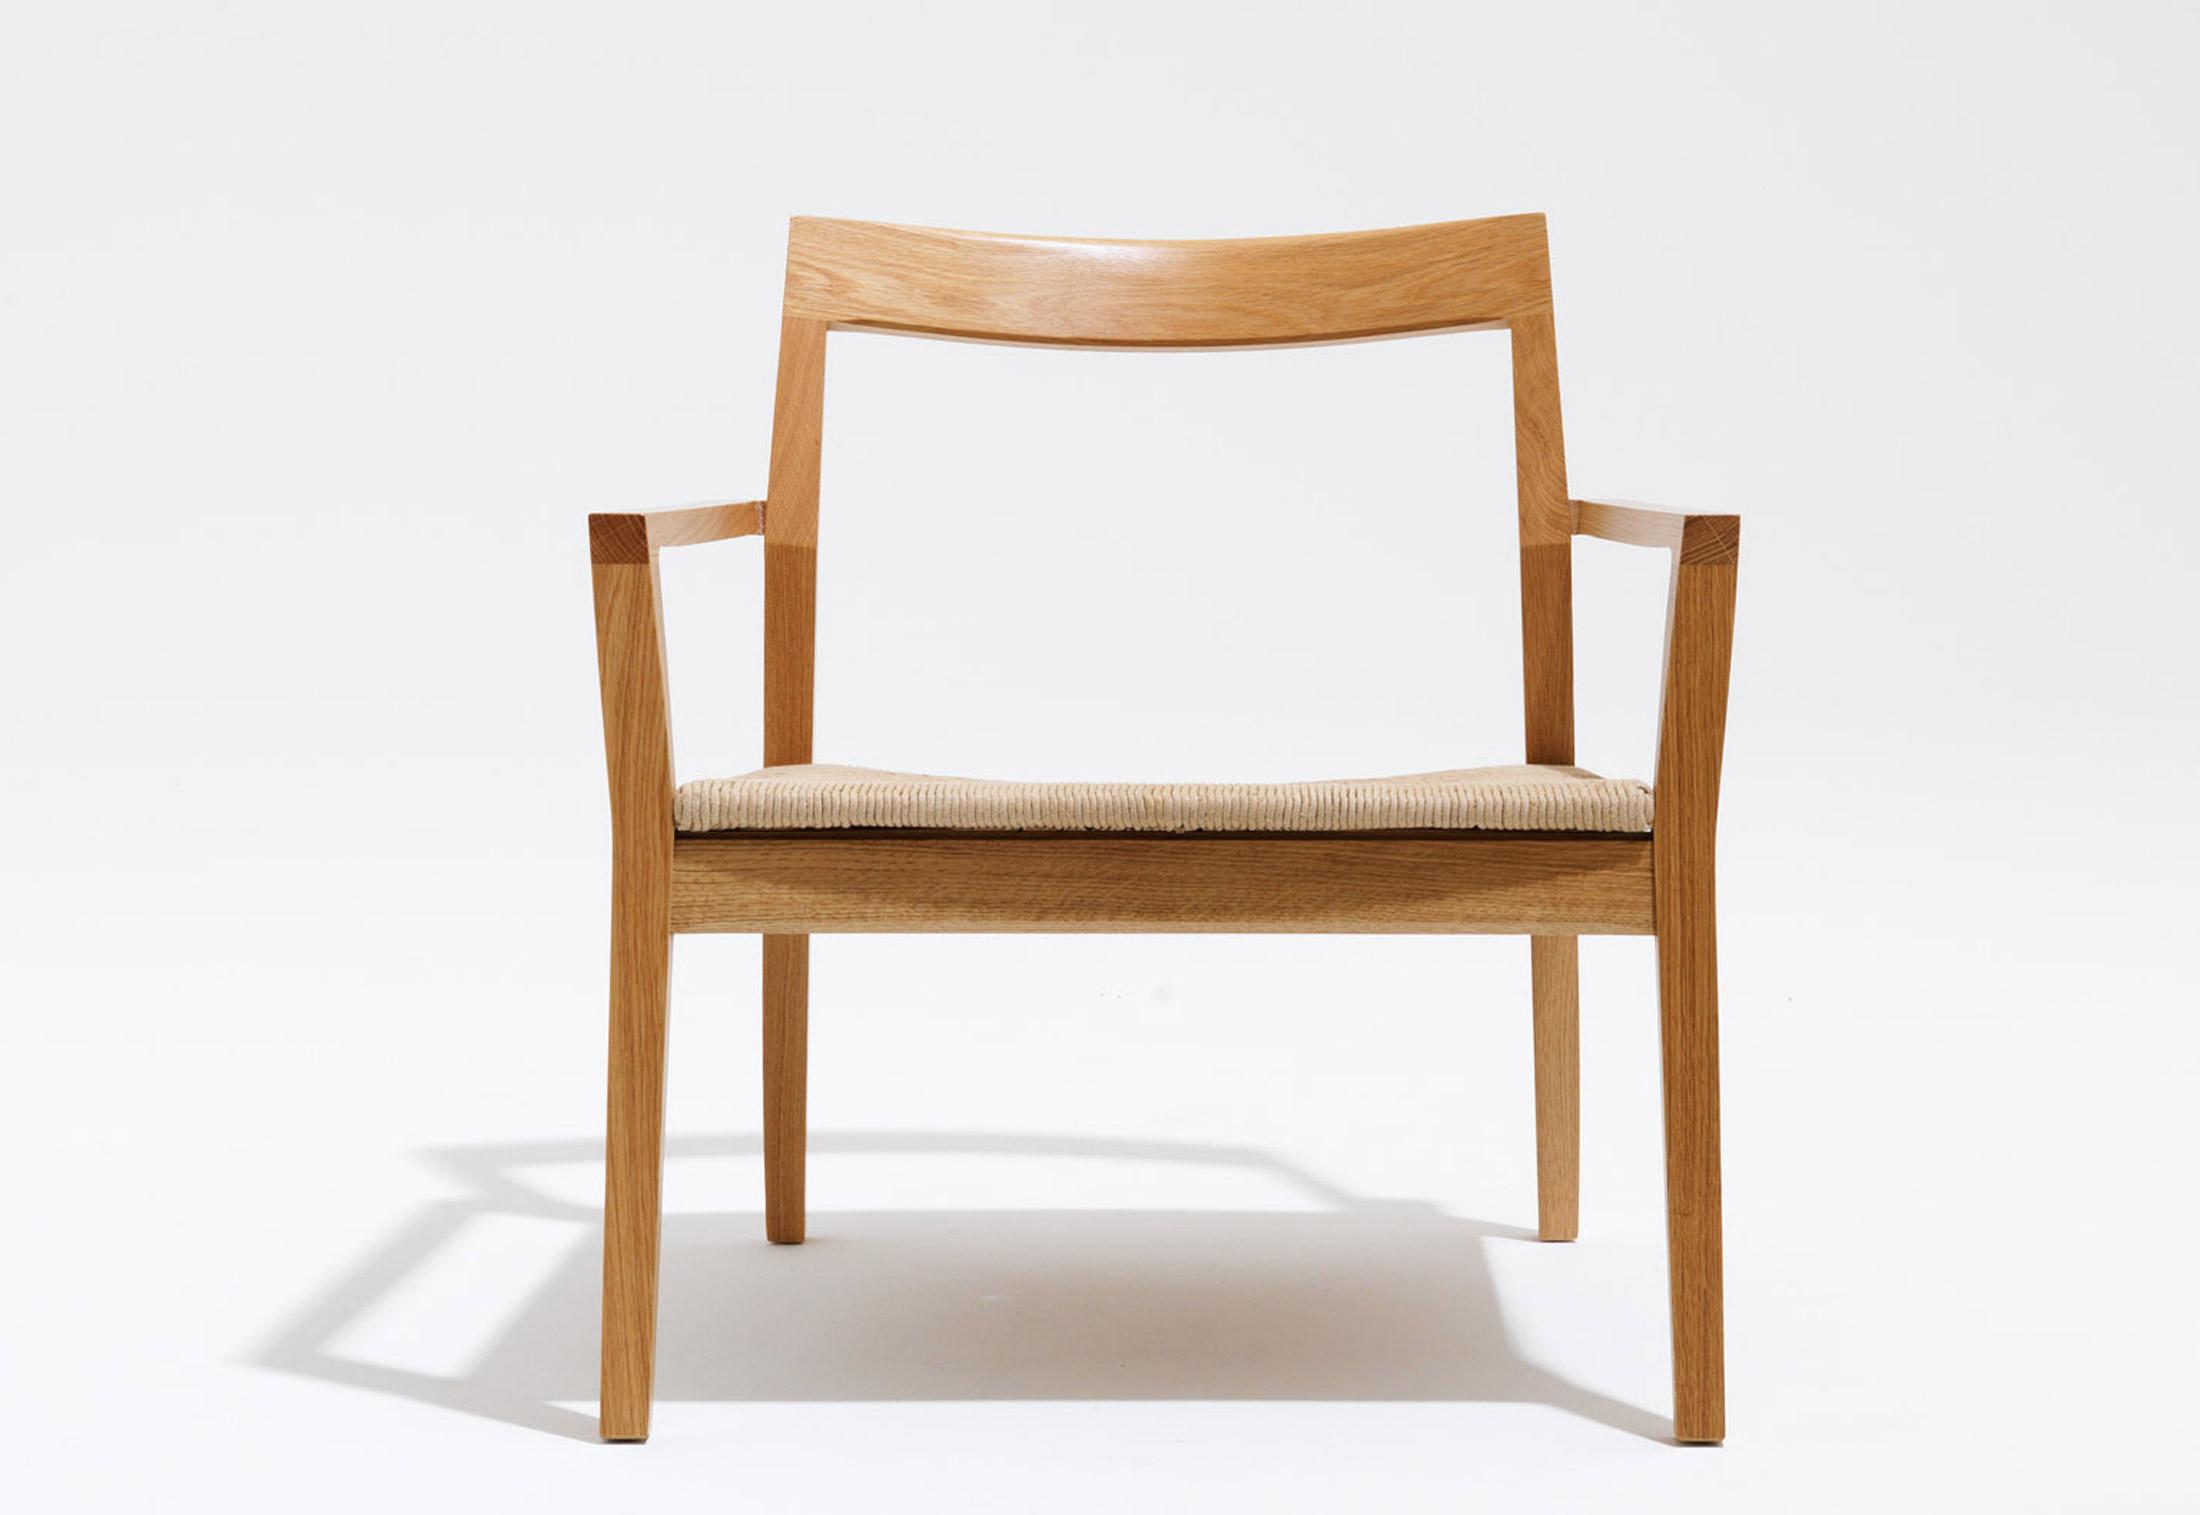 Astounding Krusin Lounge Chair With Armrests By Knoll Stylepark Creativecarmelina Interior Chair Design Creativecarmelinacom